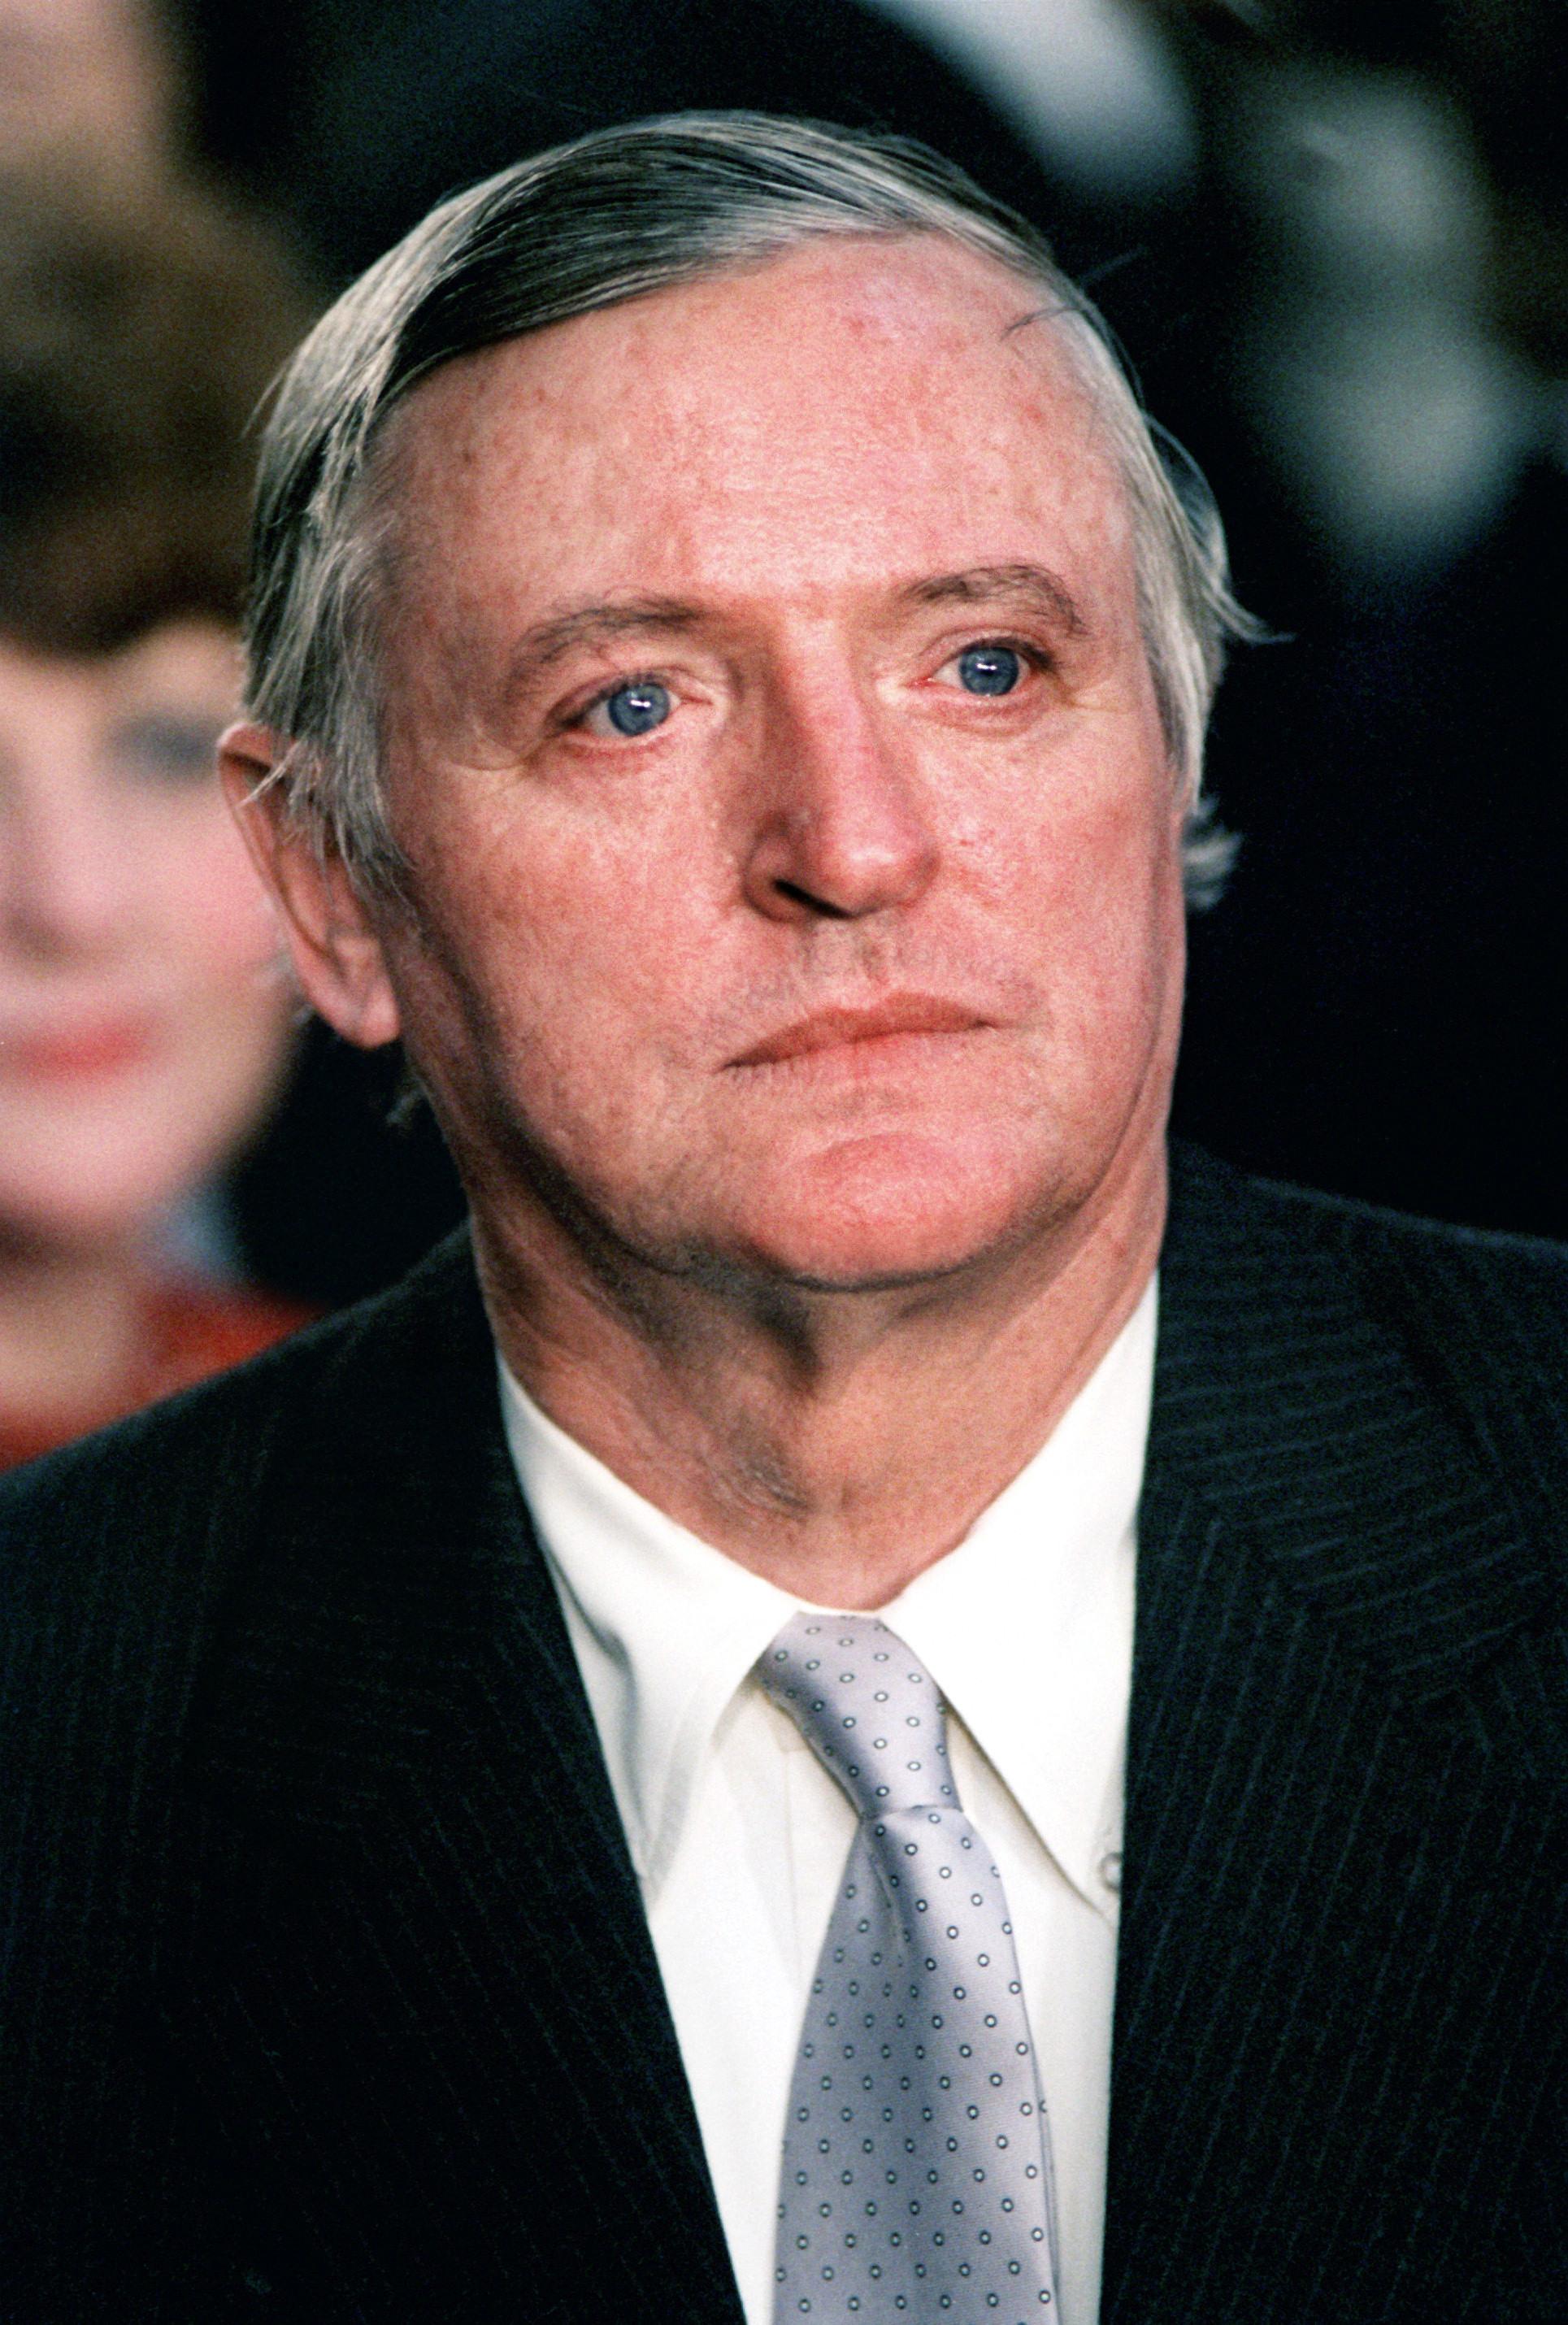 D. A. Buckley